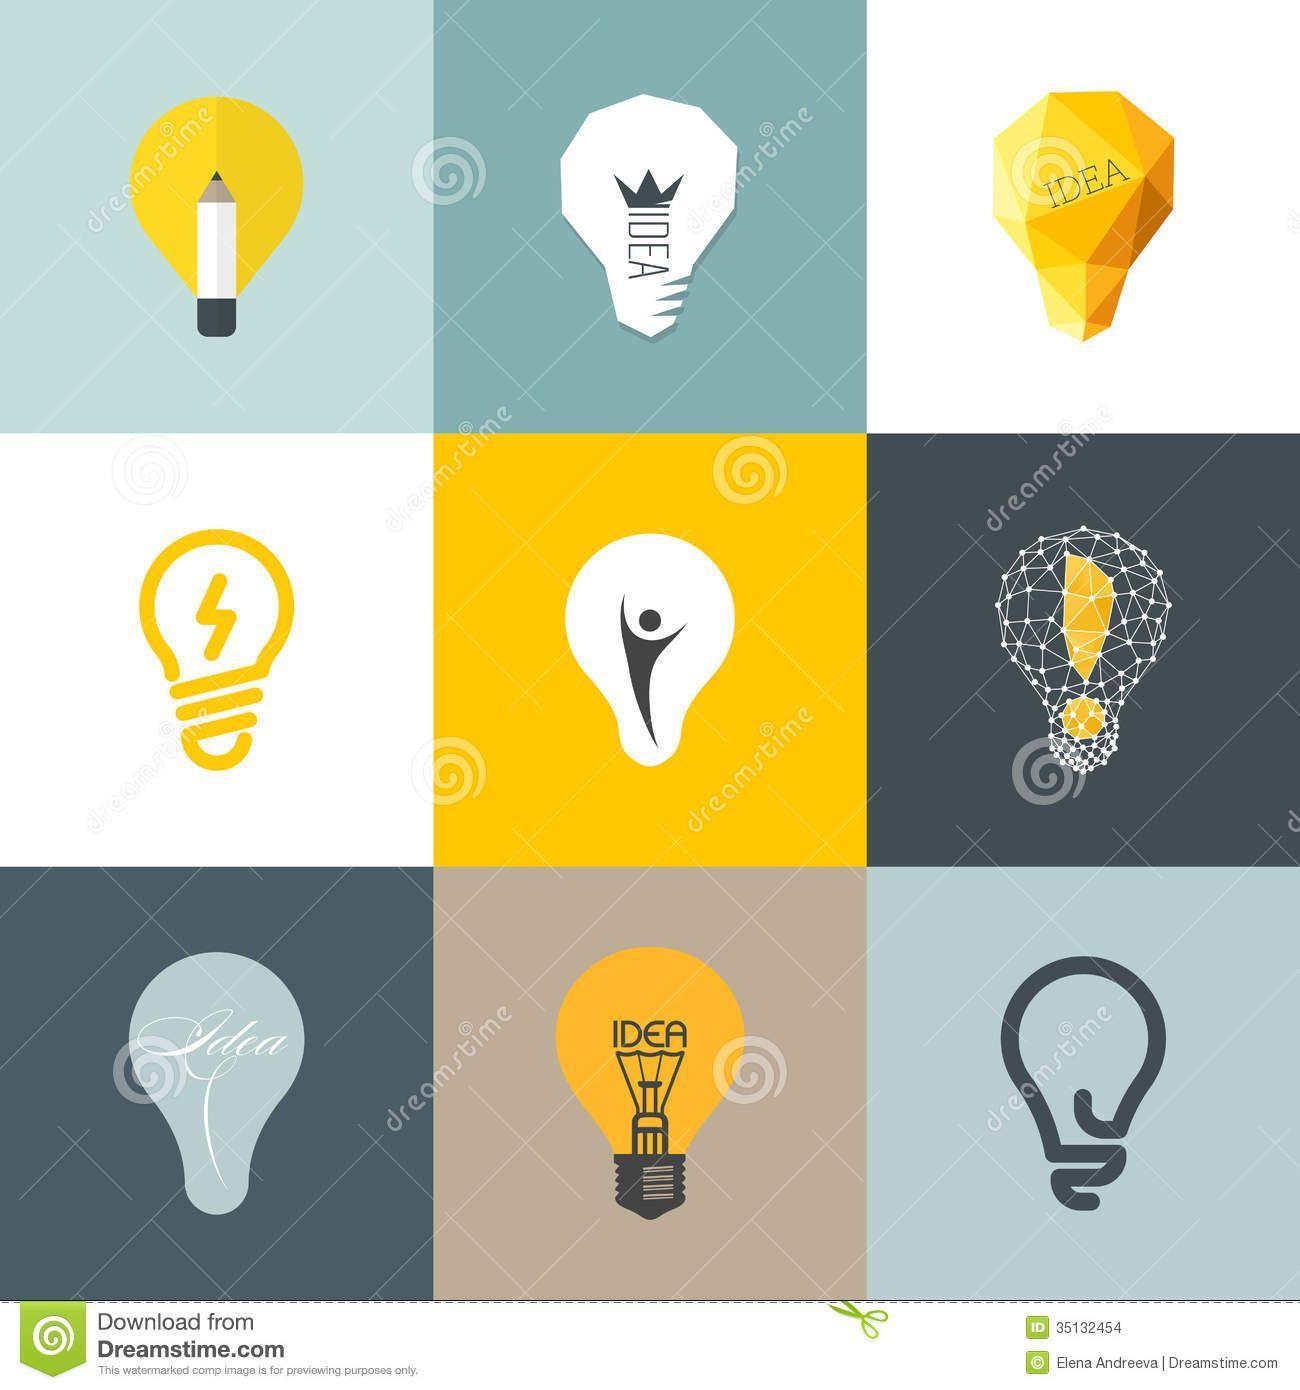 light bulb logo design Google Search Identidade visual